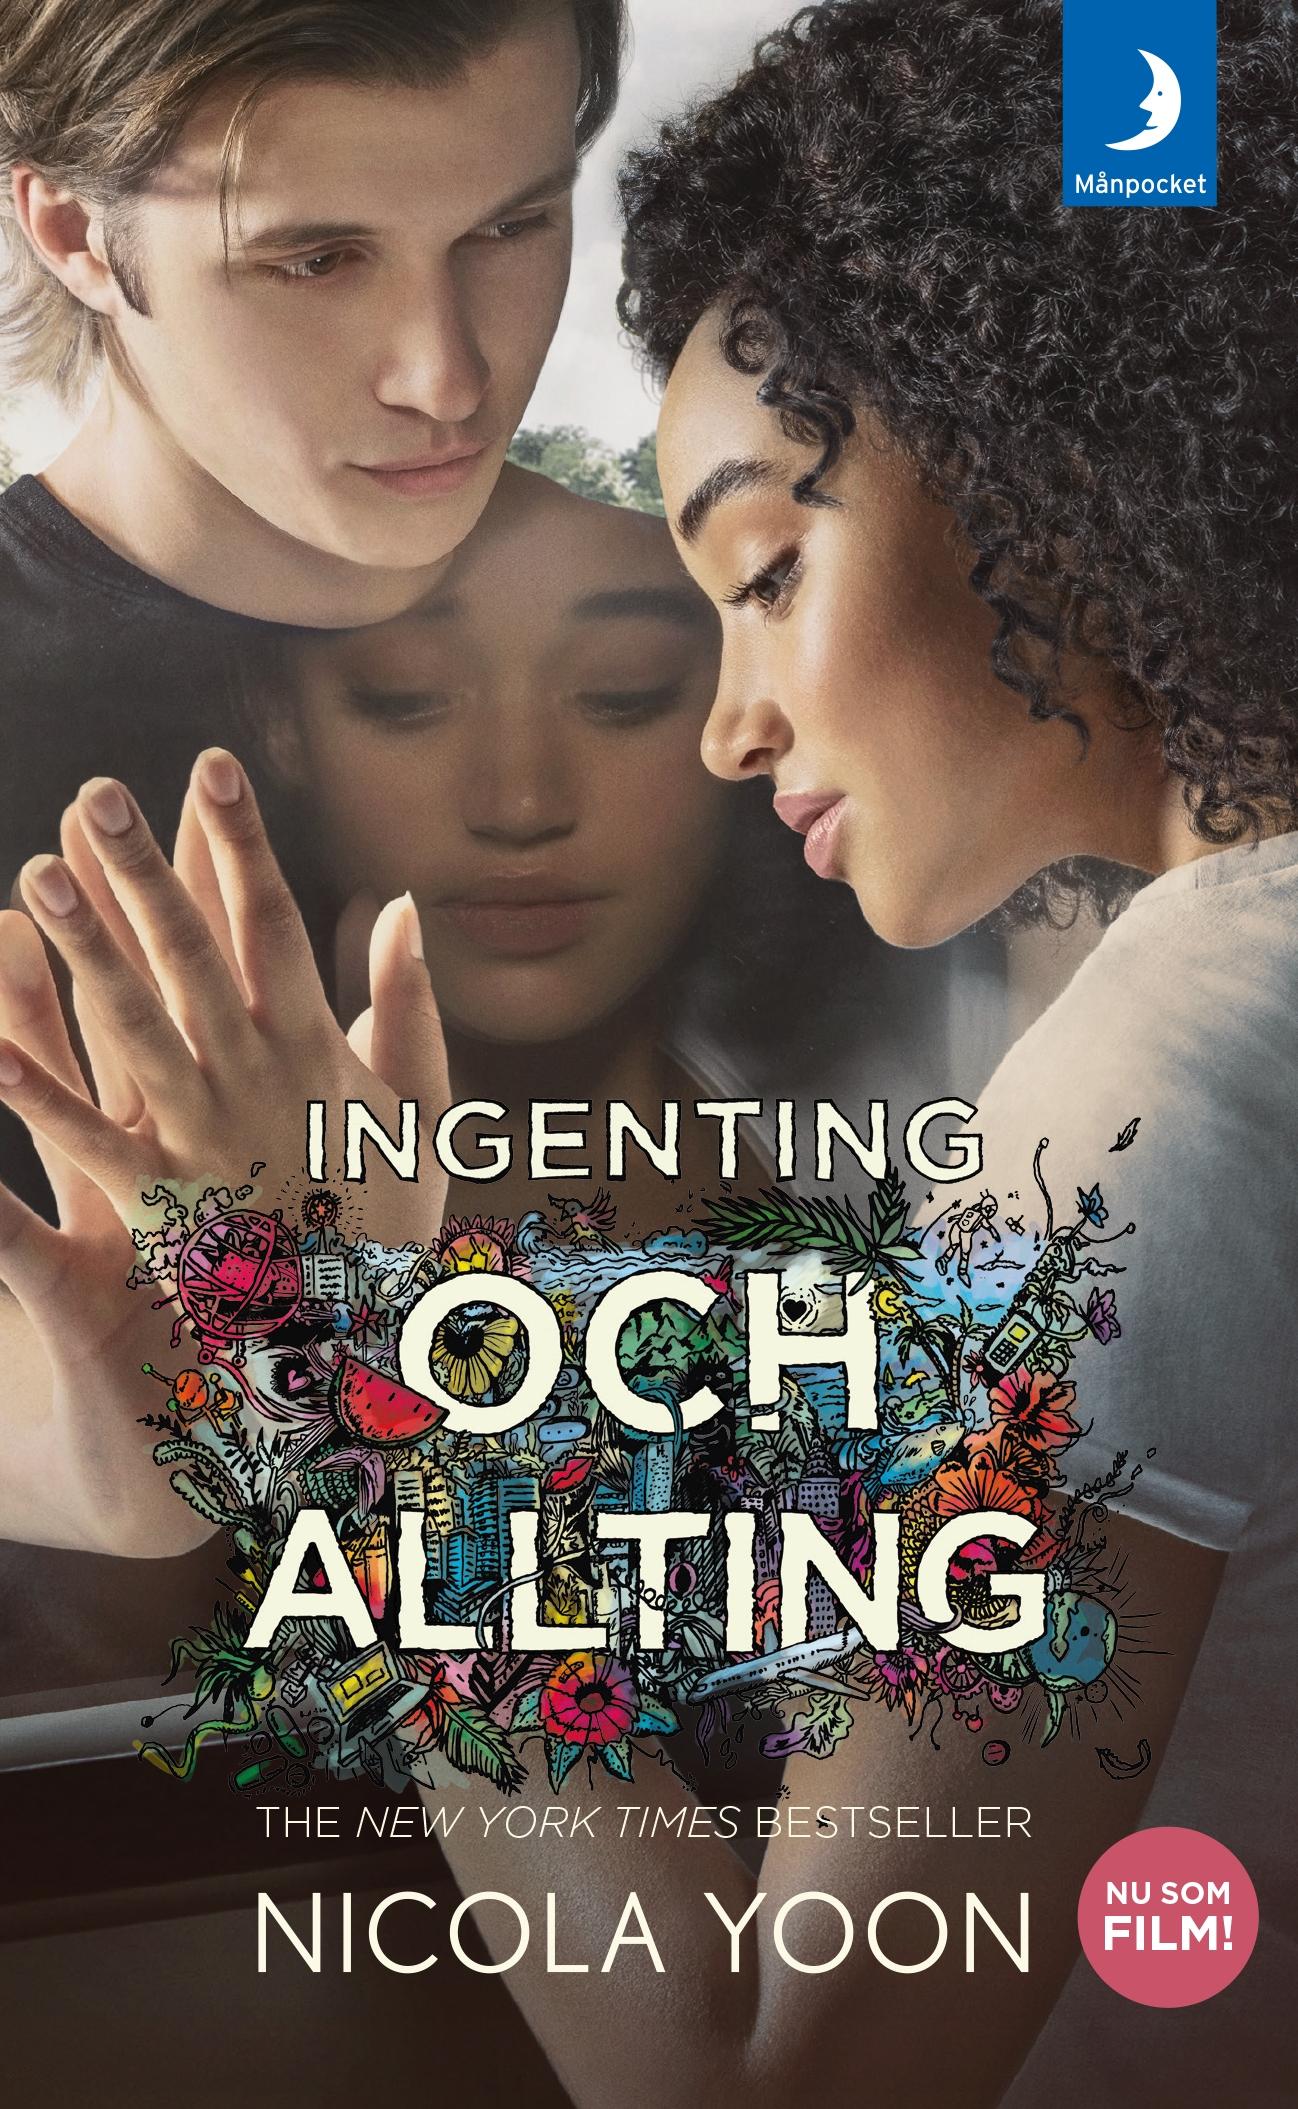 Image for Ingenting och allting from Suomalainen.com